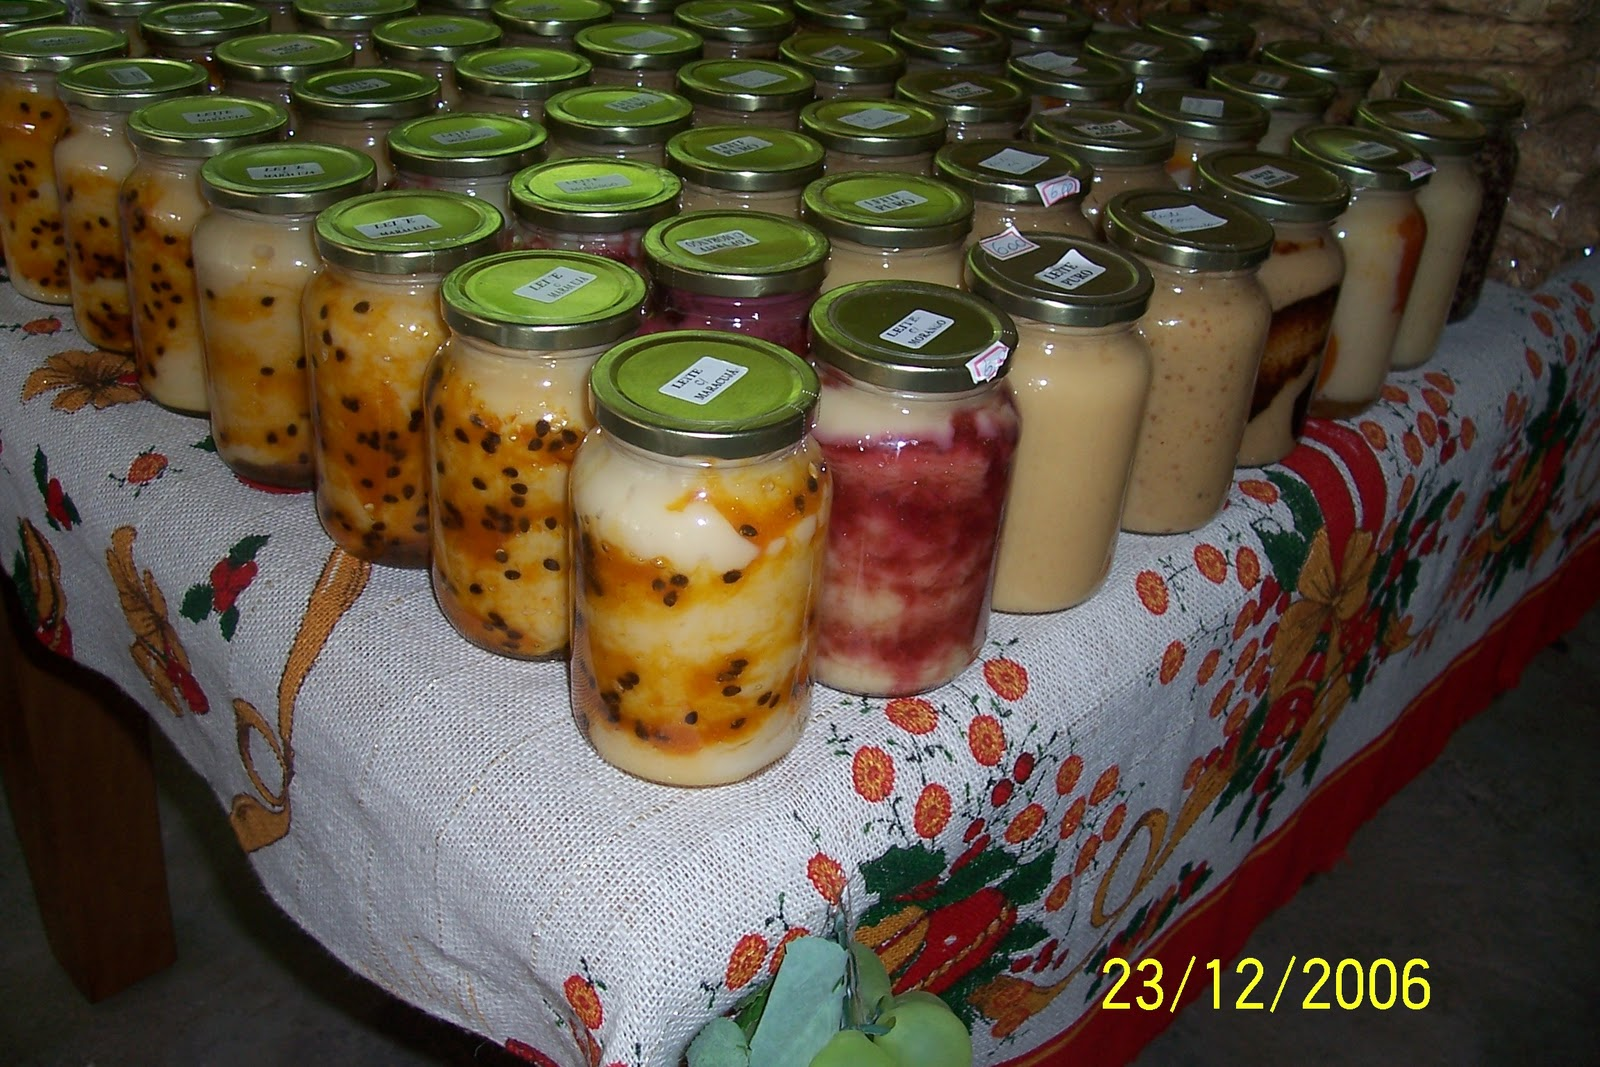 Artesanato Uniart Vinhedo ~ Expo Circuito das Frutas